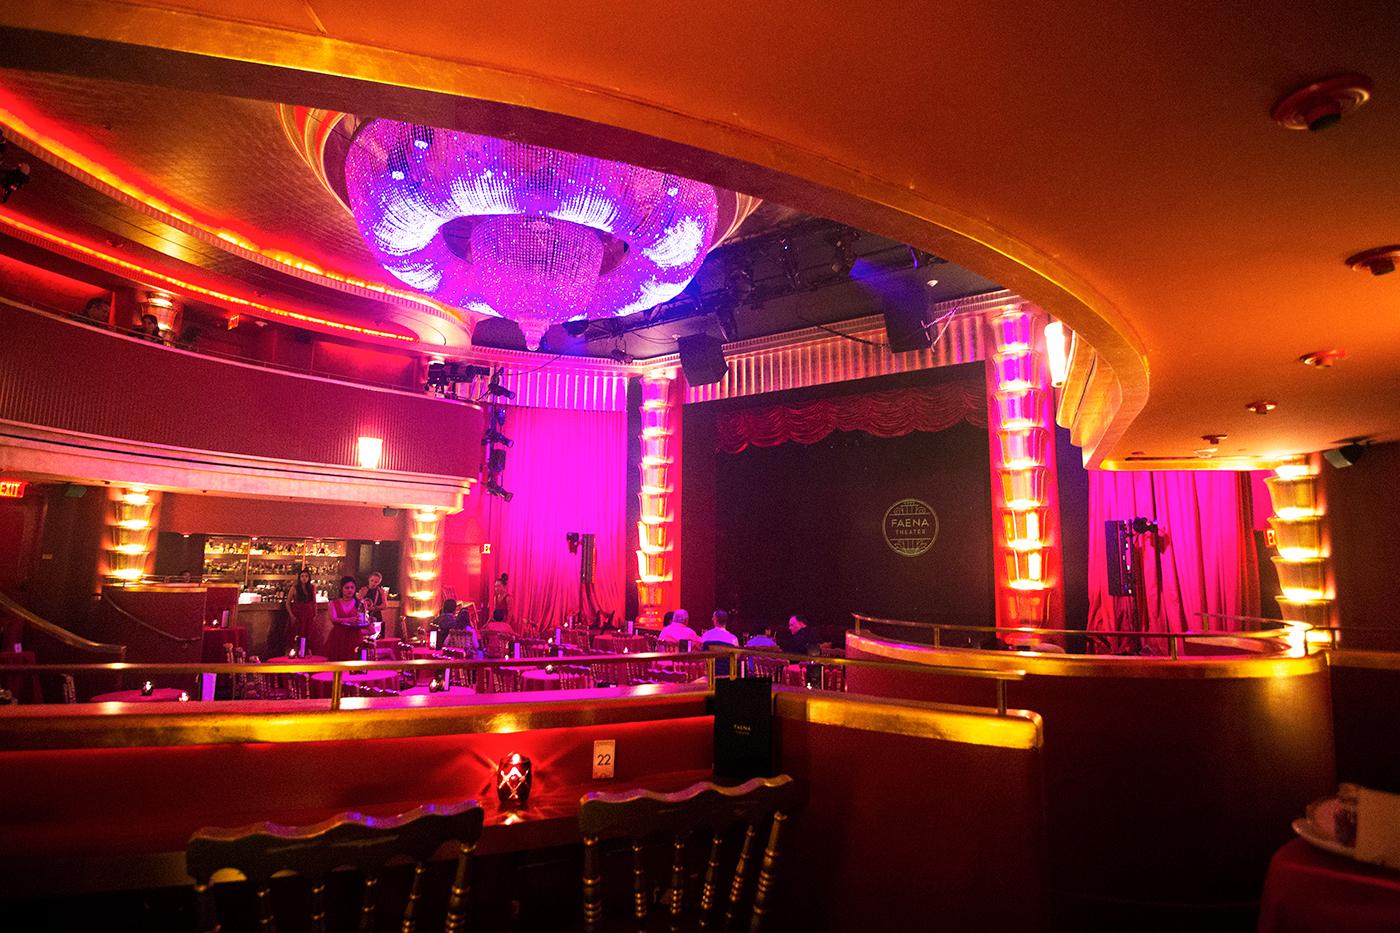 TAOS-Faena-Theater-show